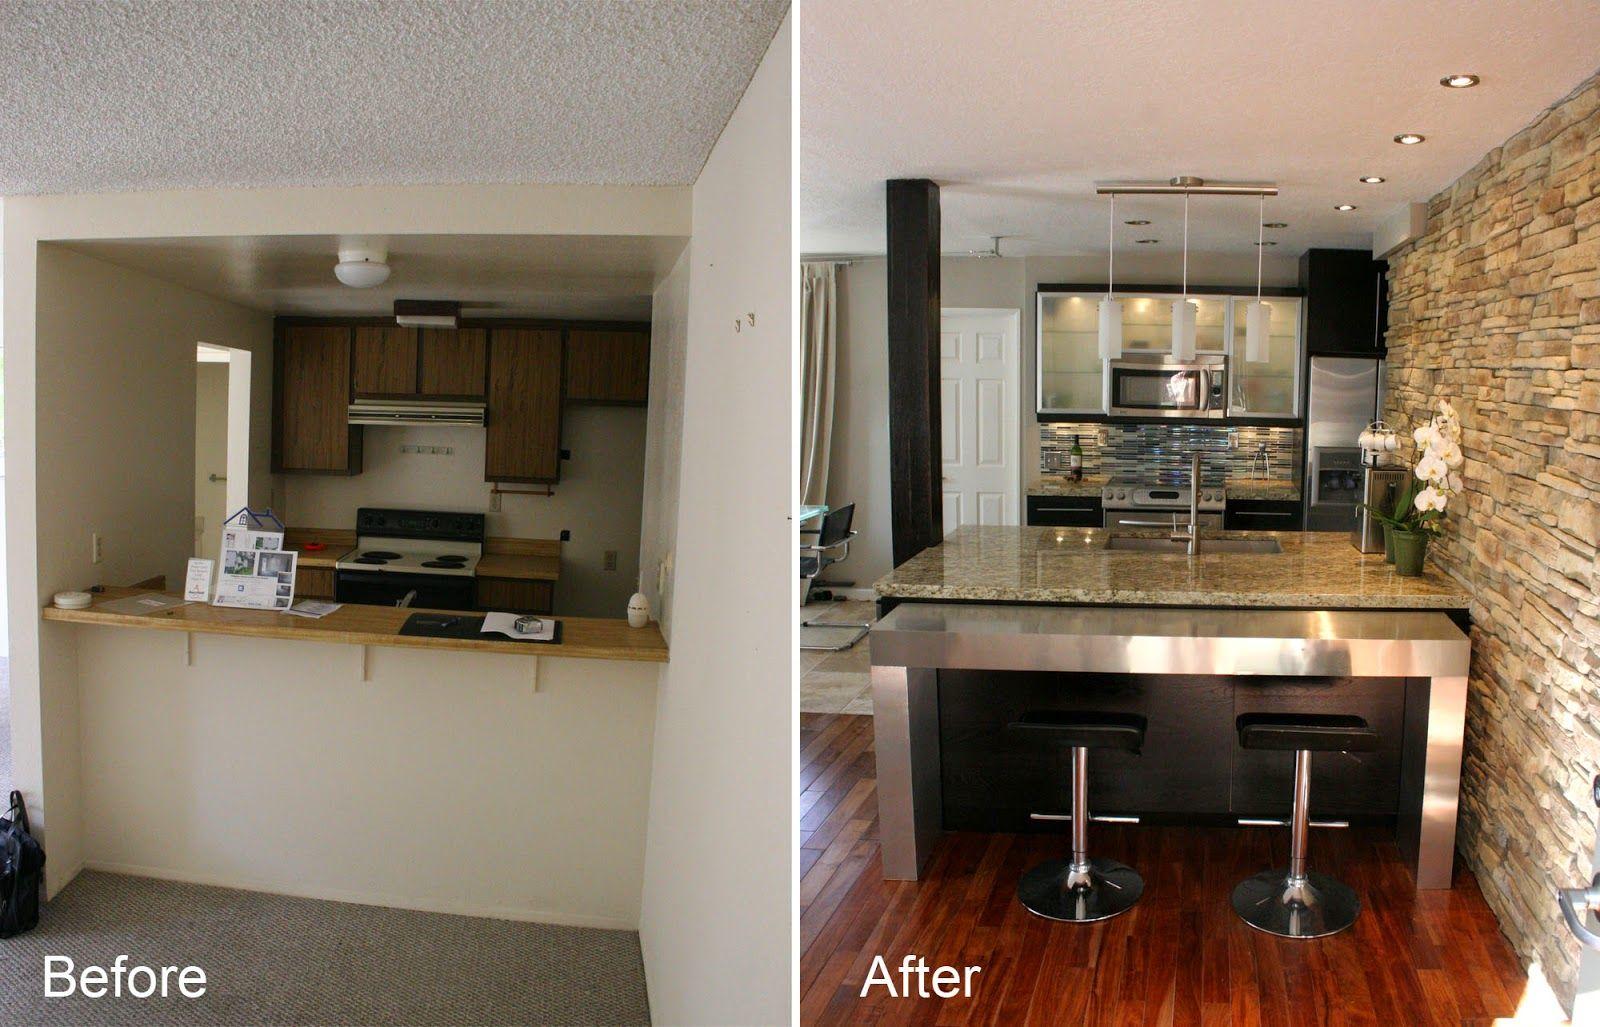 blog post planning a kitchen remodel home improvement